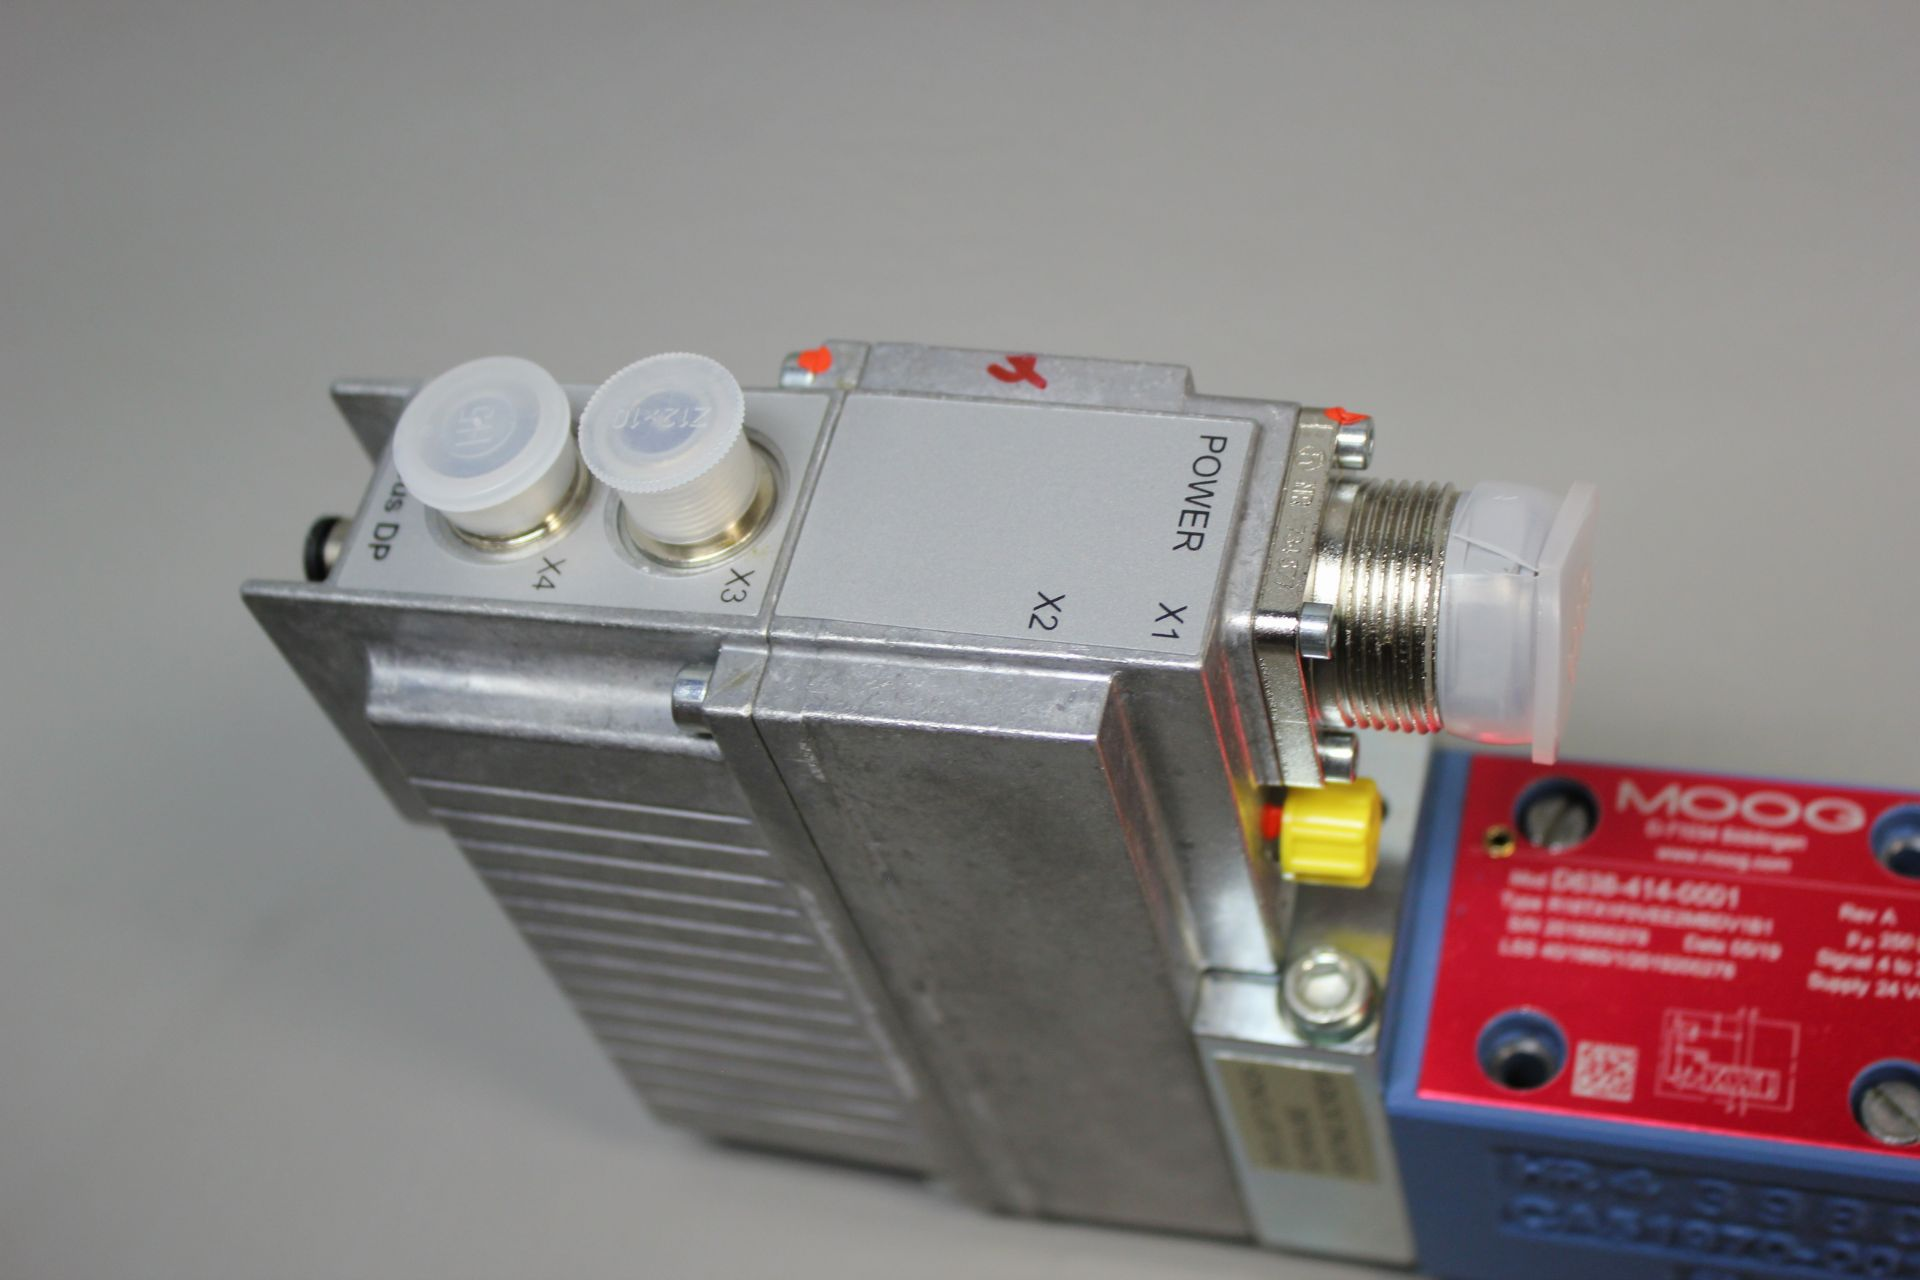 NEW MOOG DIRECT DRIVE DIGITAL CONTROL HYDRAULIC SERVO VALVE - Image 7 of 12